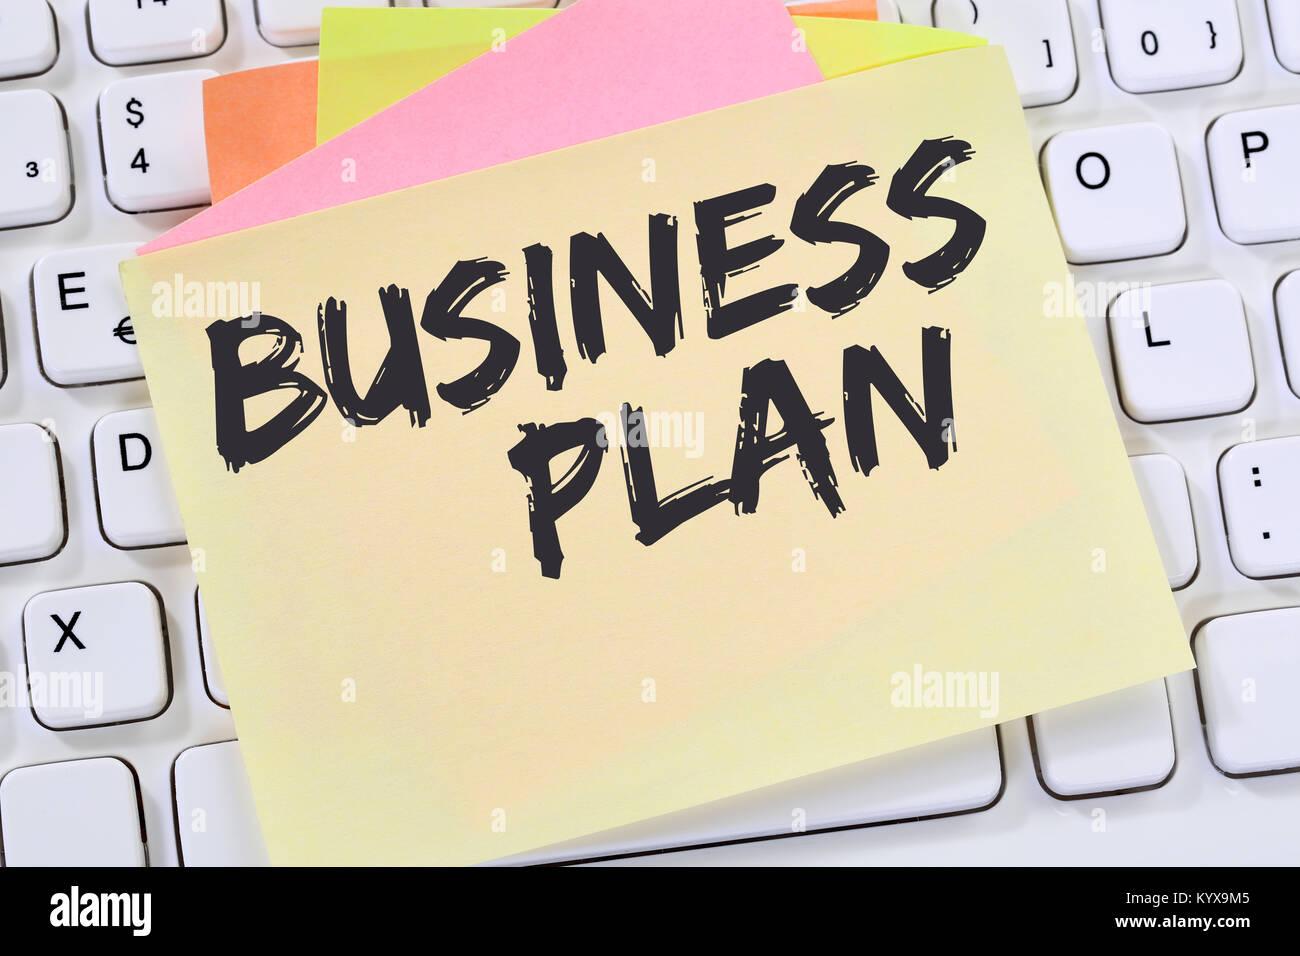 Plan de Negocios estrategia de análisis del concepto de éxito empresa nota de papel teclado de ordenador Imagen De Stock